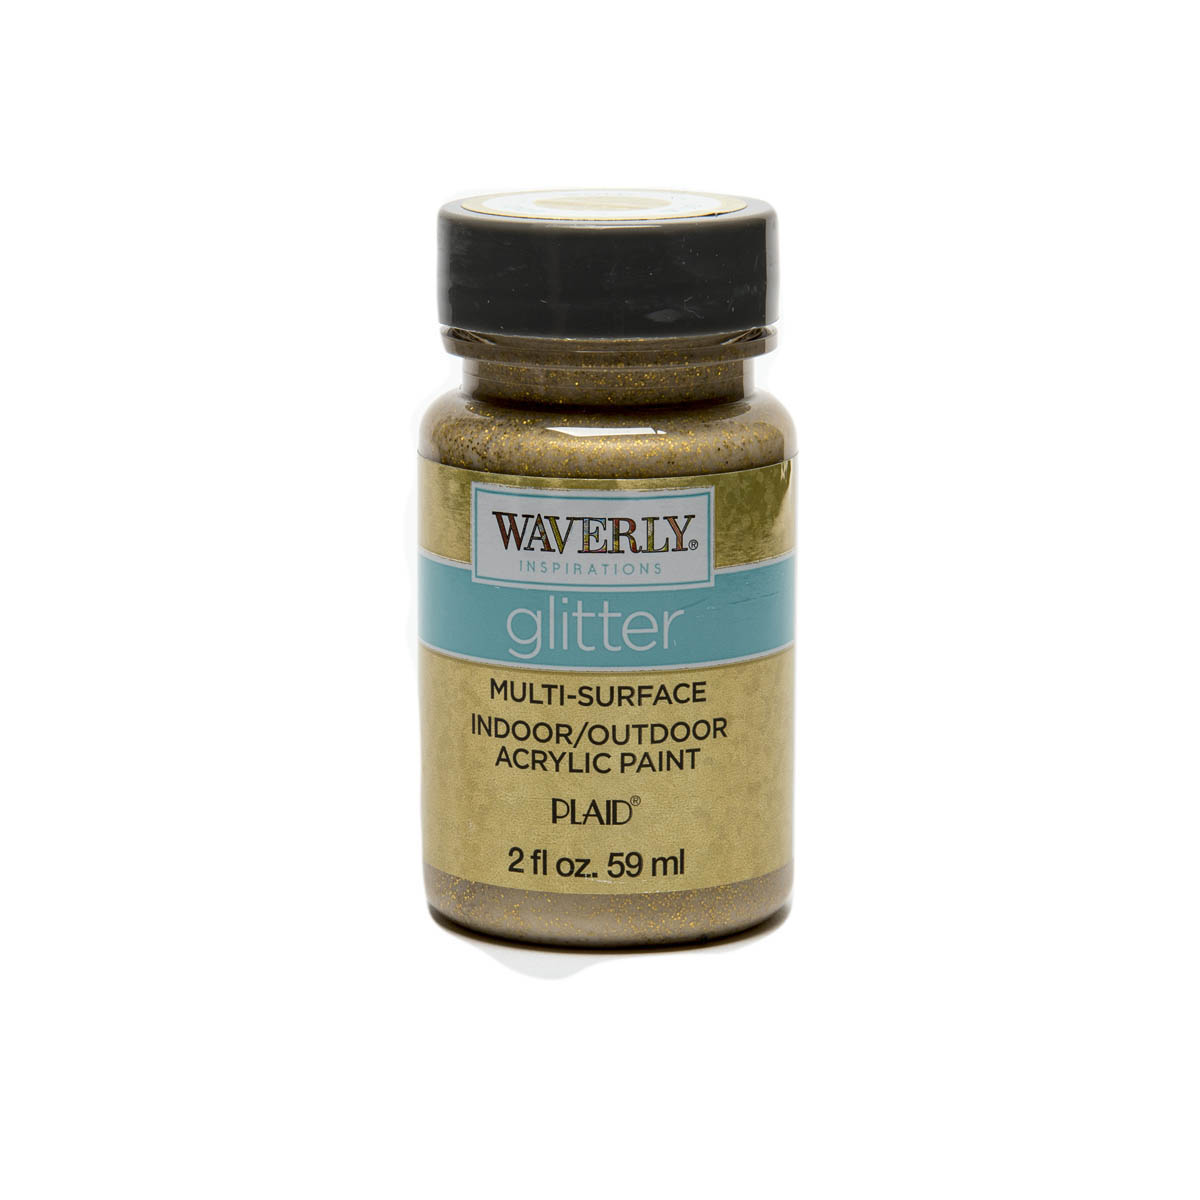 Waverly ® Inspirations Glitter Multi-Surface Acrylic Paint - Gold, 2 oz.